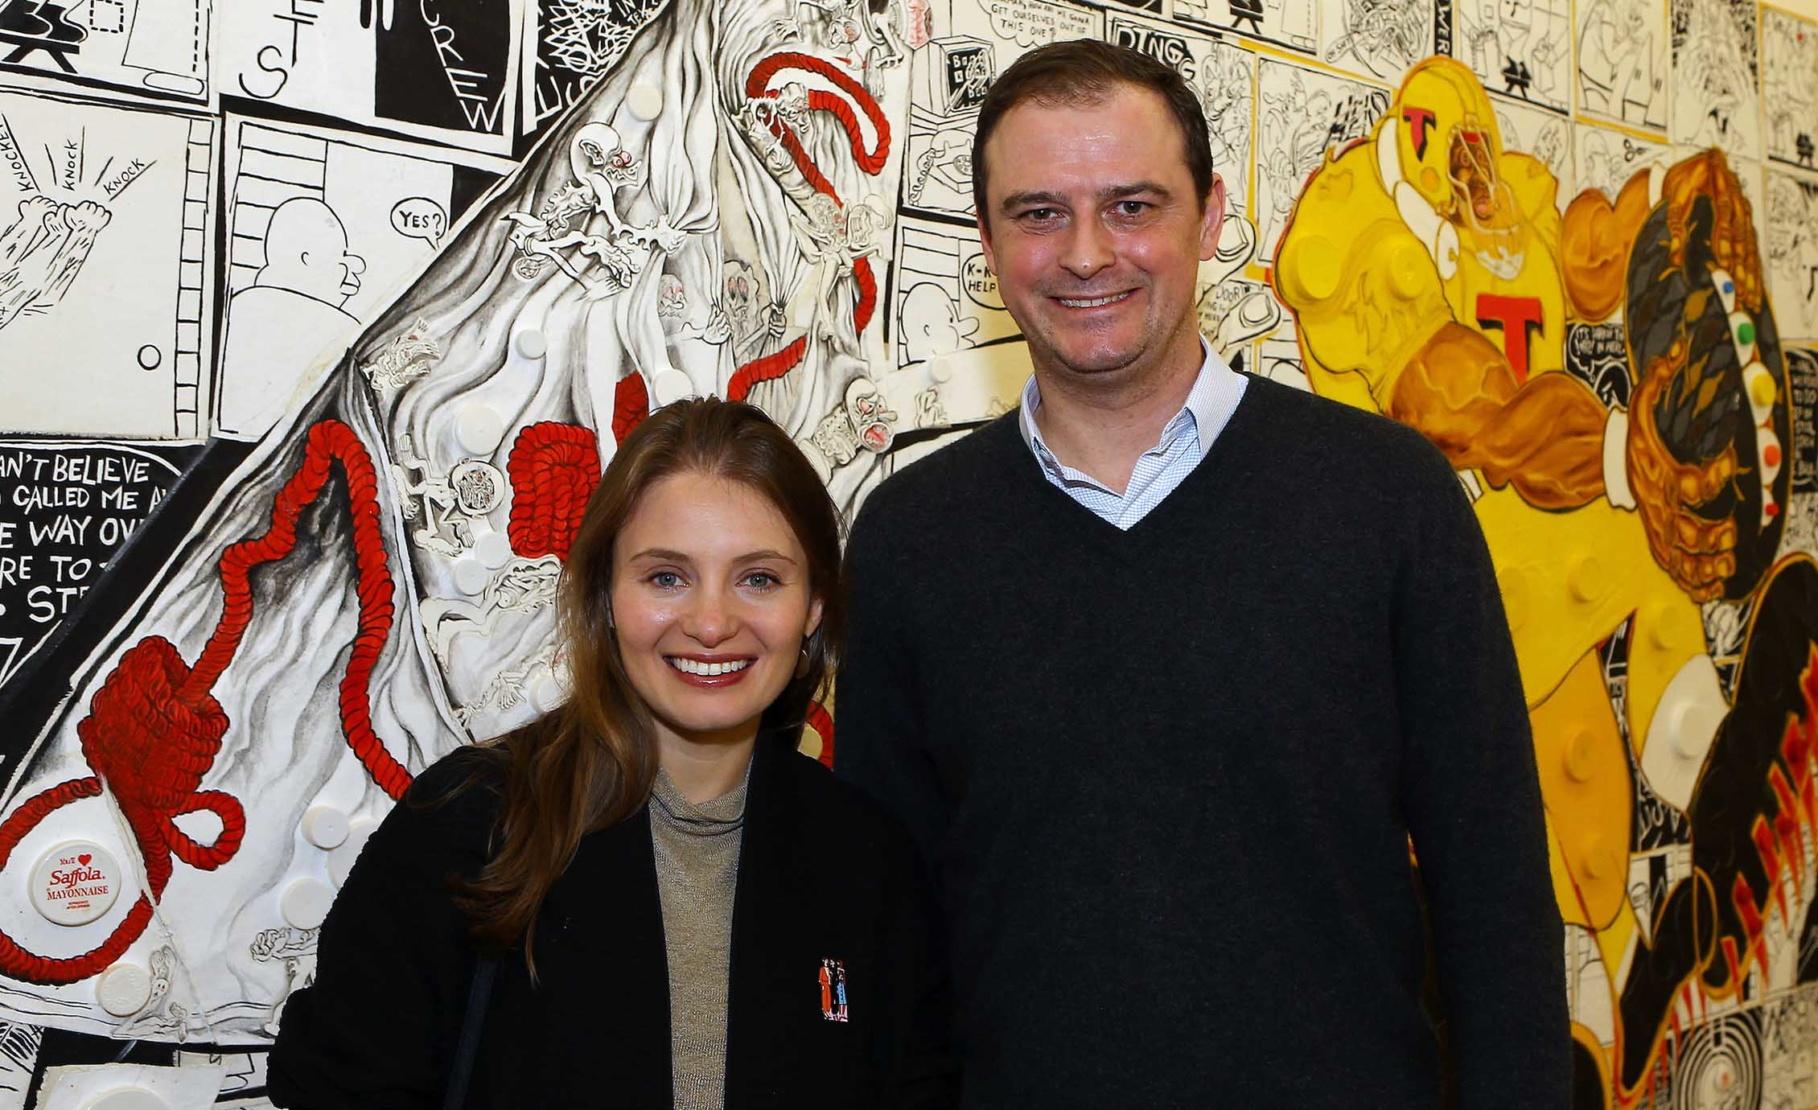 Anna Raginskaya and Dan Desmond